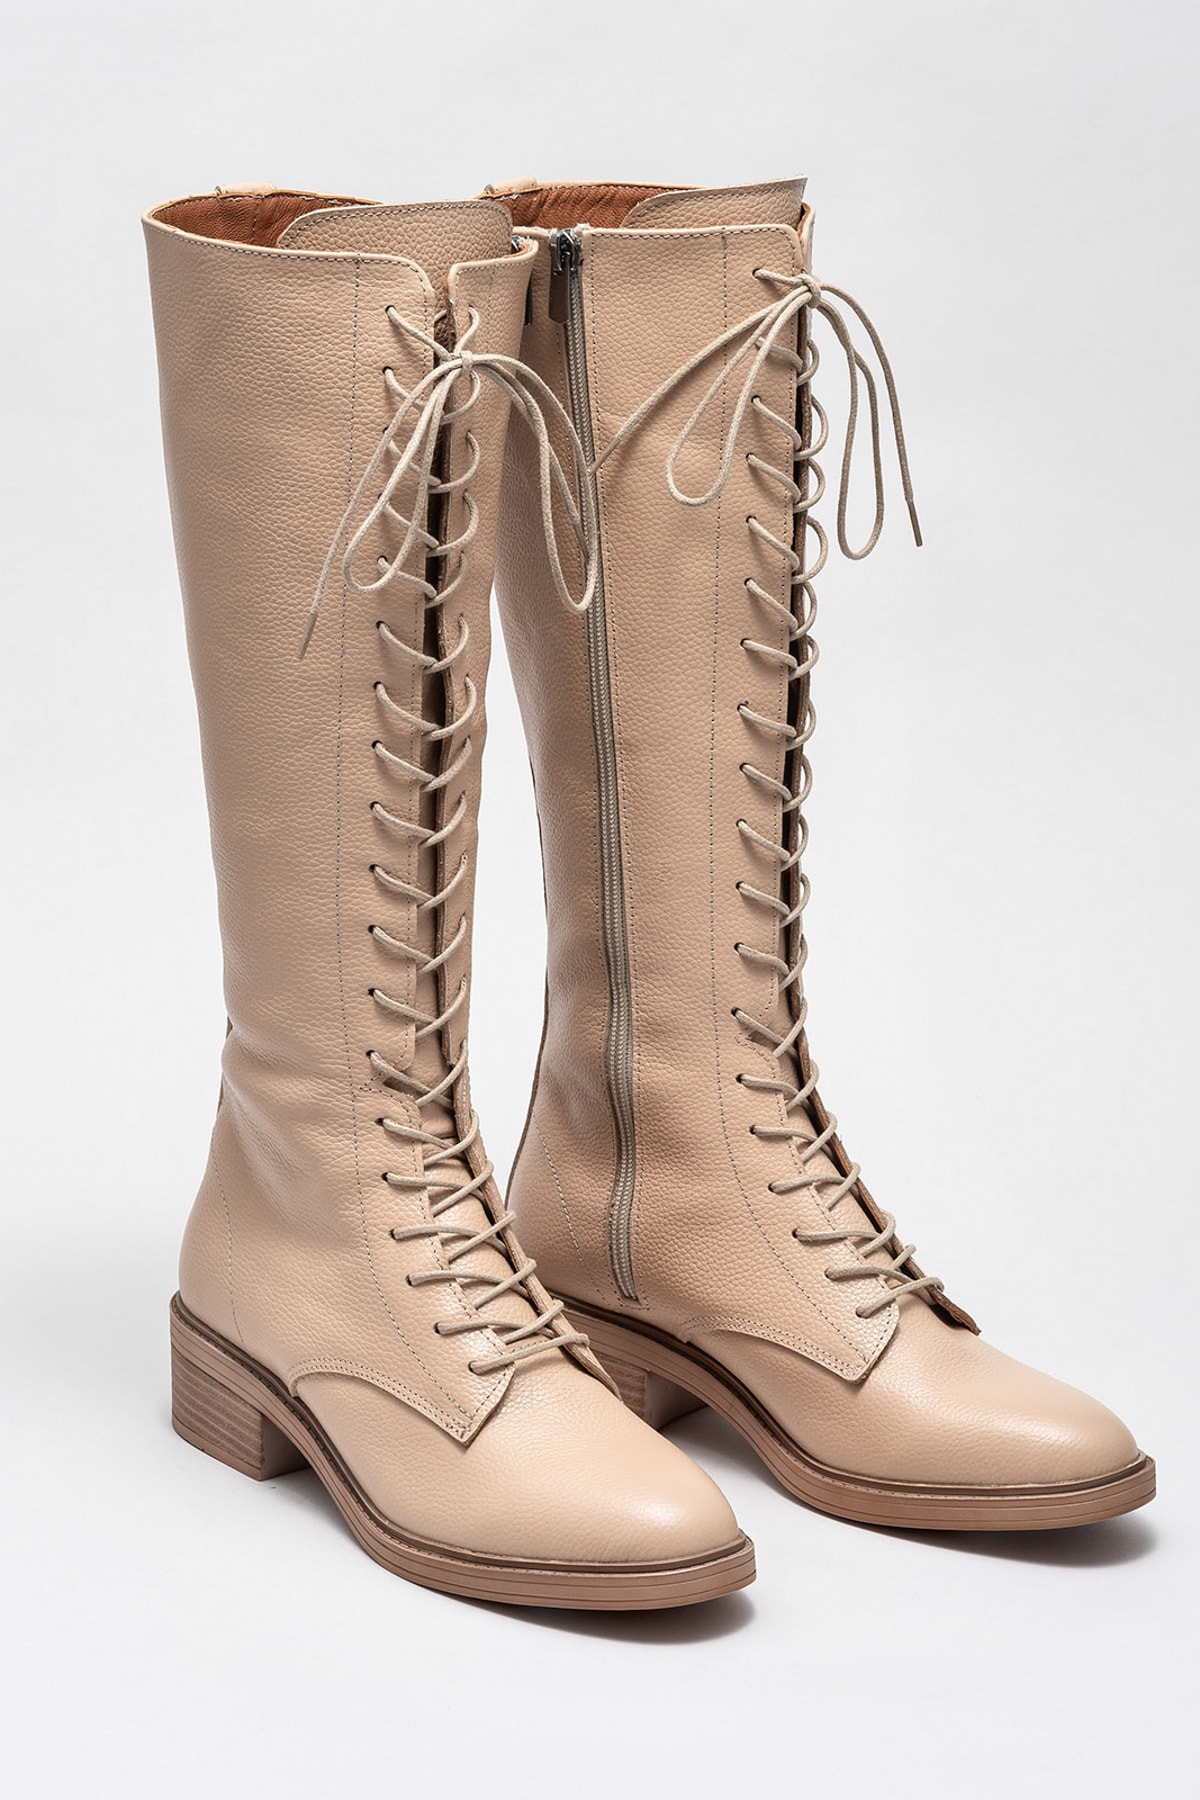 Elle Shoes Kadın Çizme Dallys 20KBS6636 2